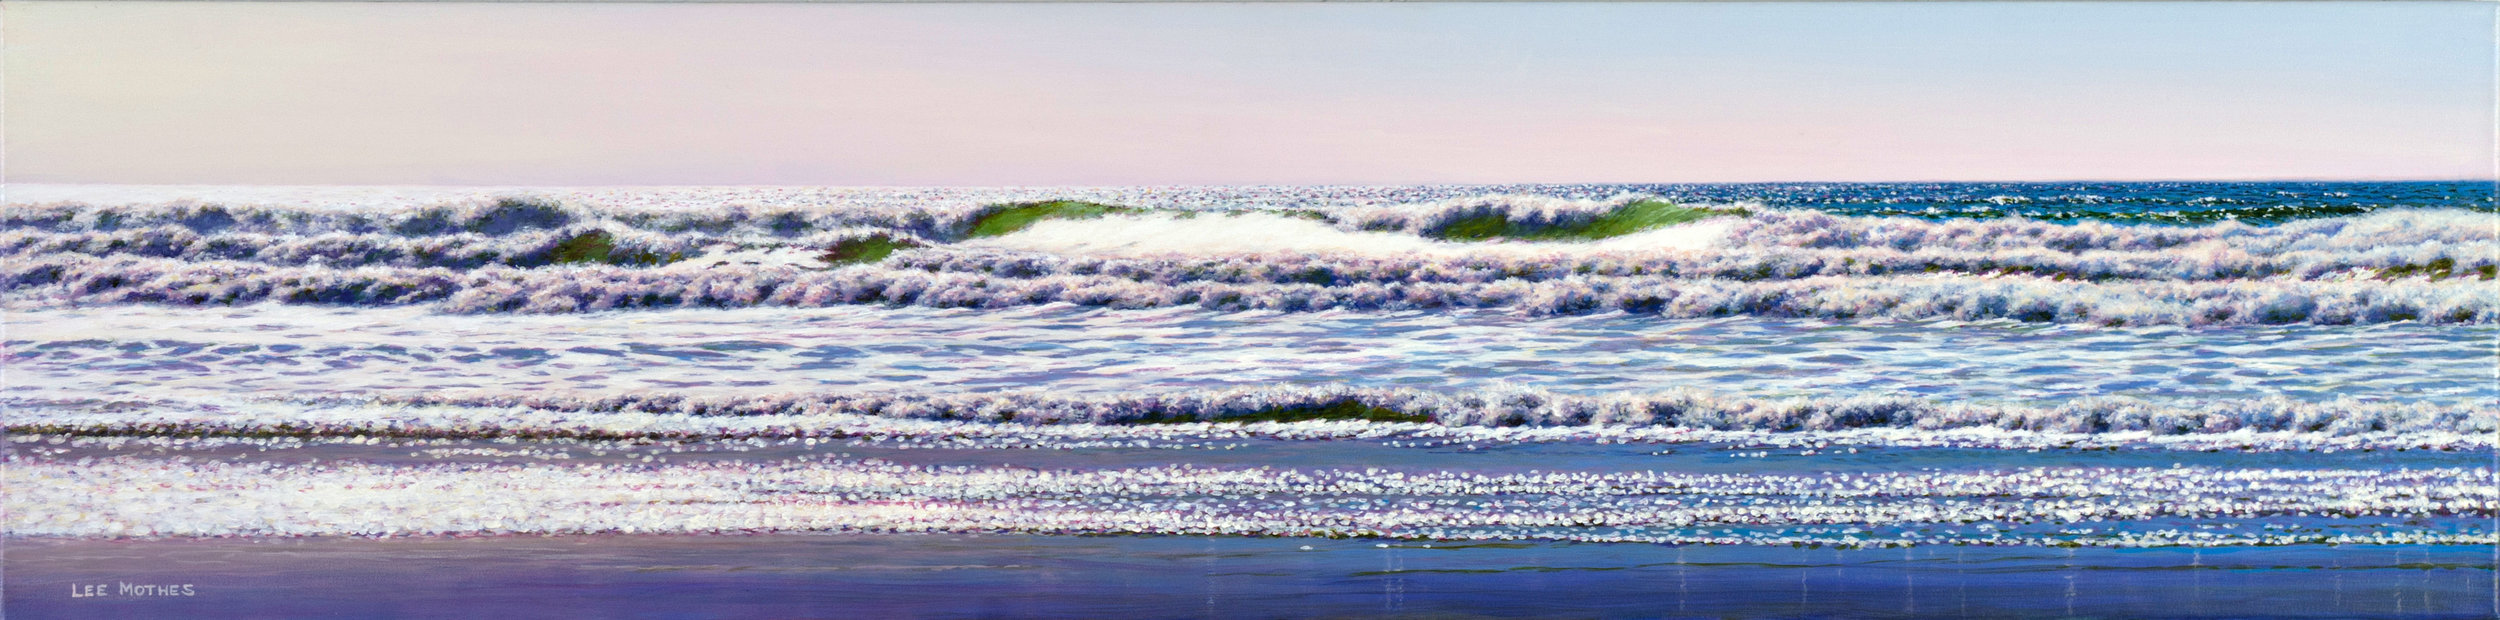 "Long Surf 10 -Oregon Coast, 12"" by 48"" acrylic on canvas (sold)"